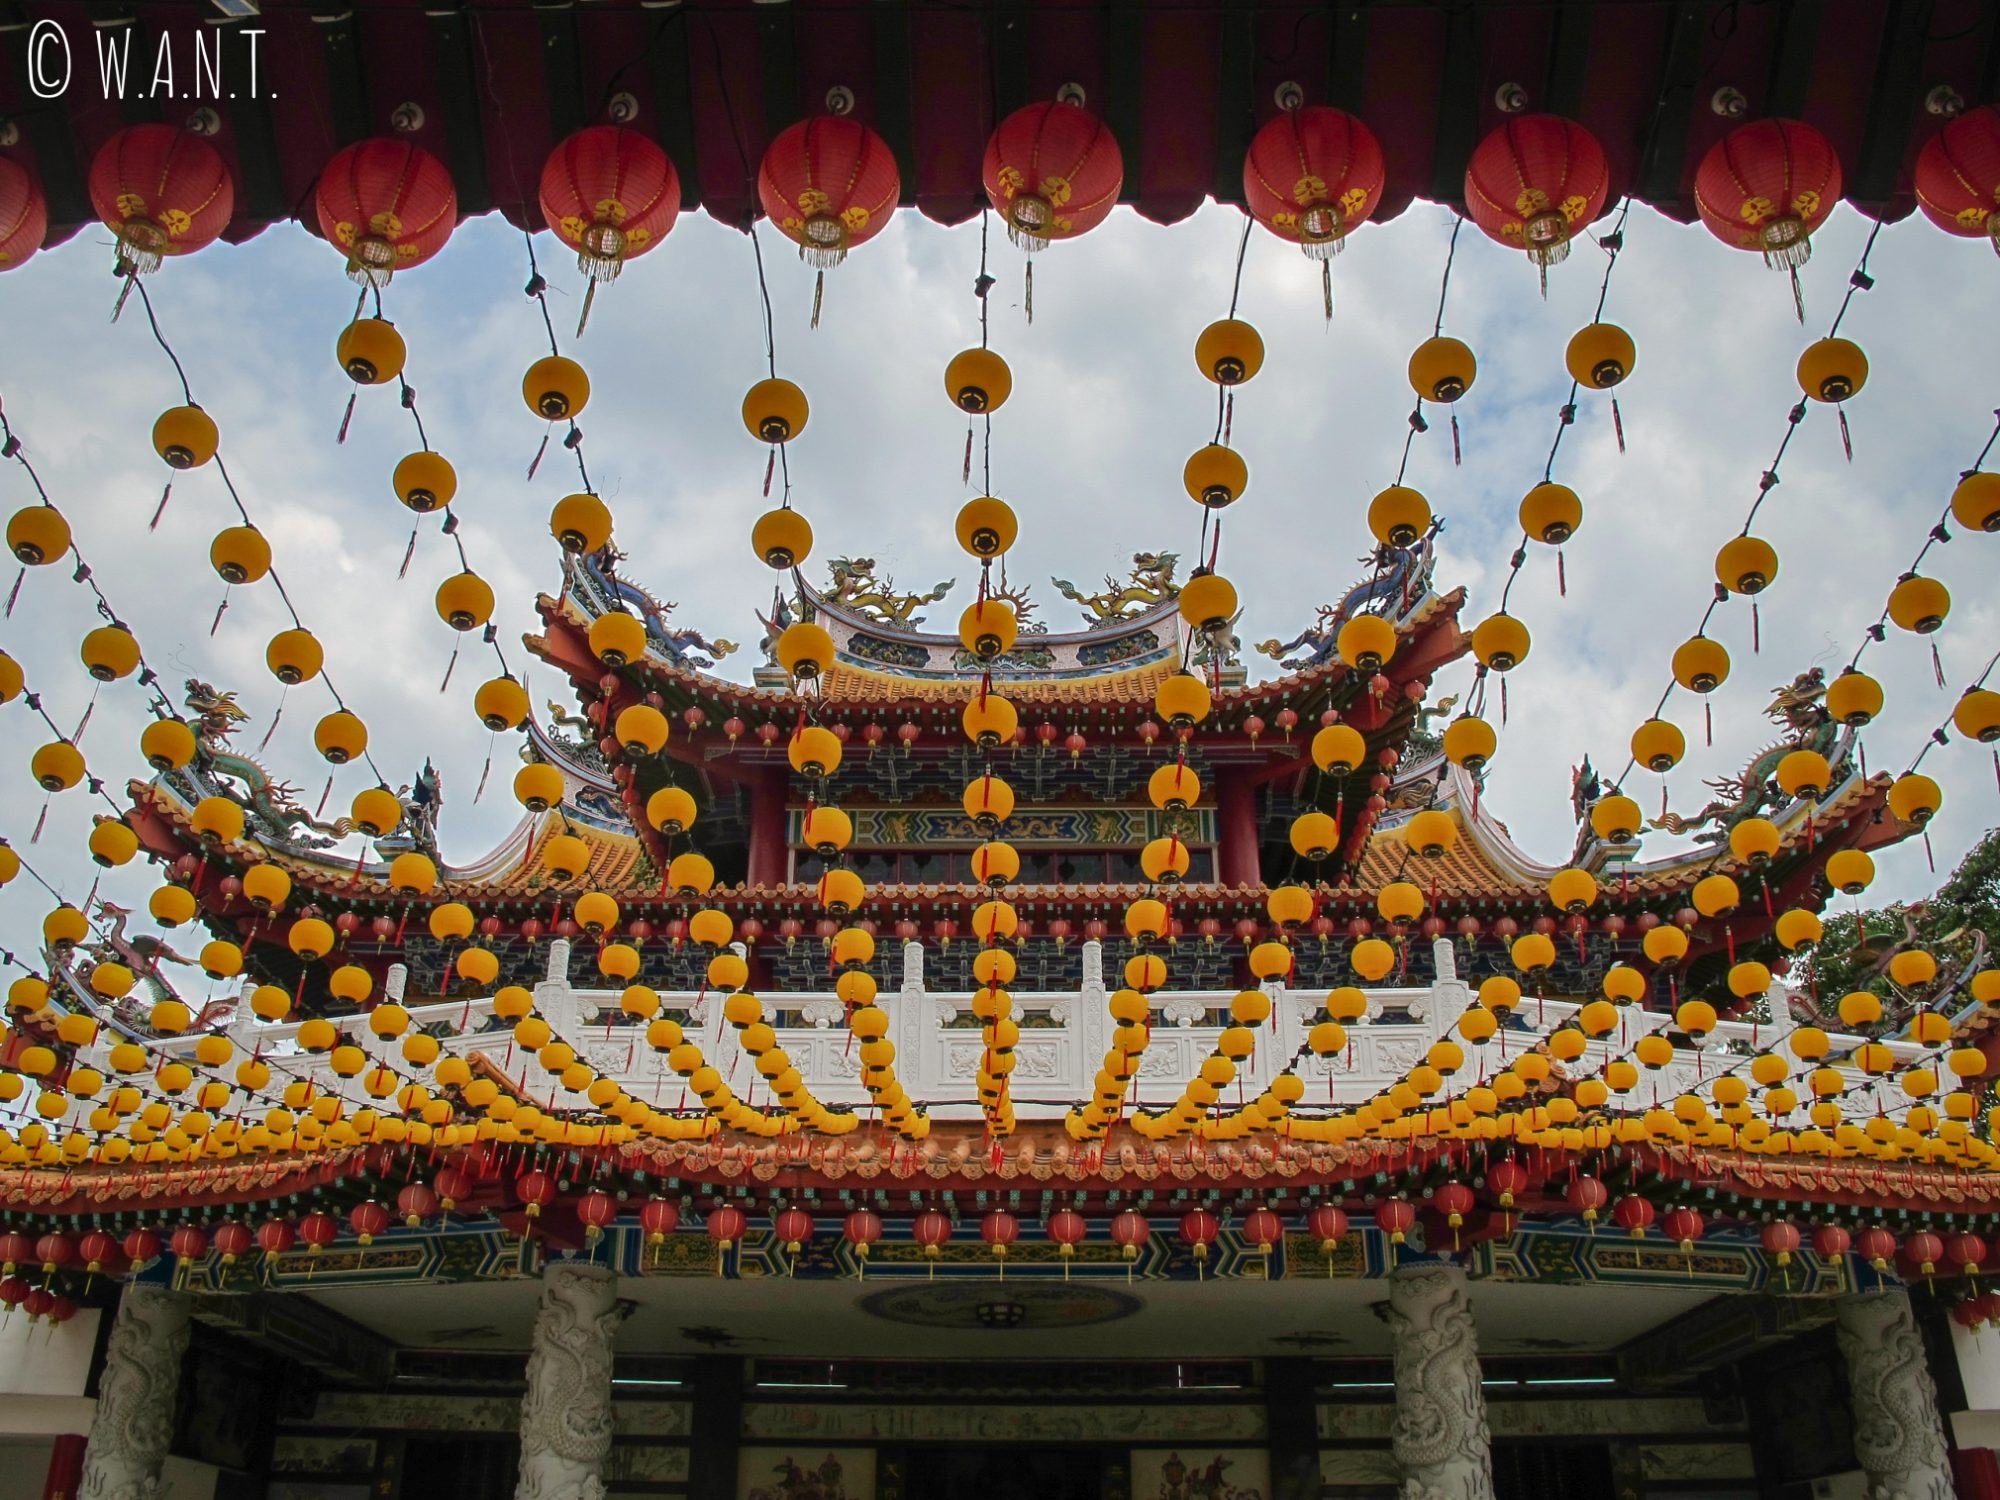 Façade du temple chinois Thean Hou Temple de Kuala Lumpur